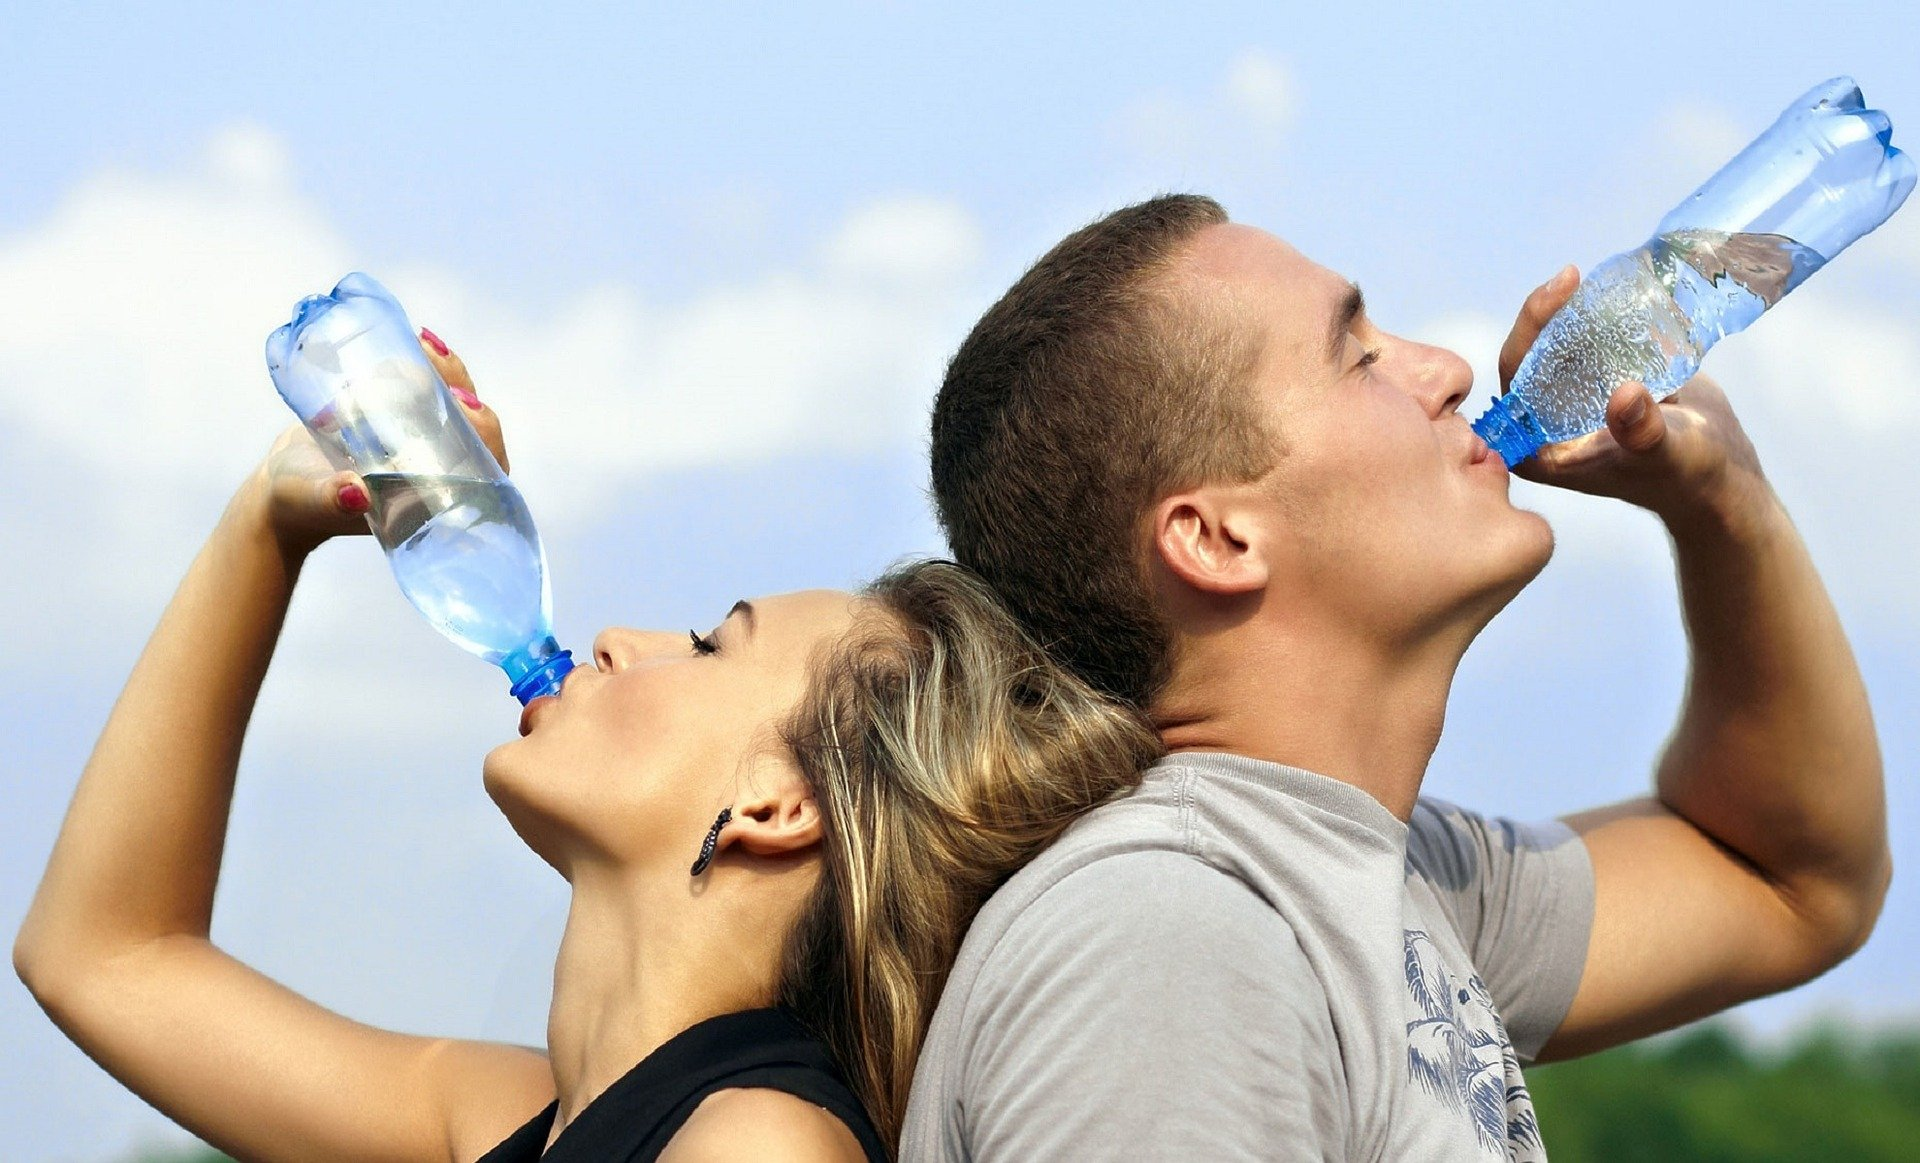 quanta acqua bere durante una gara